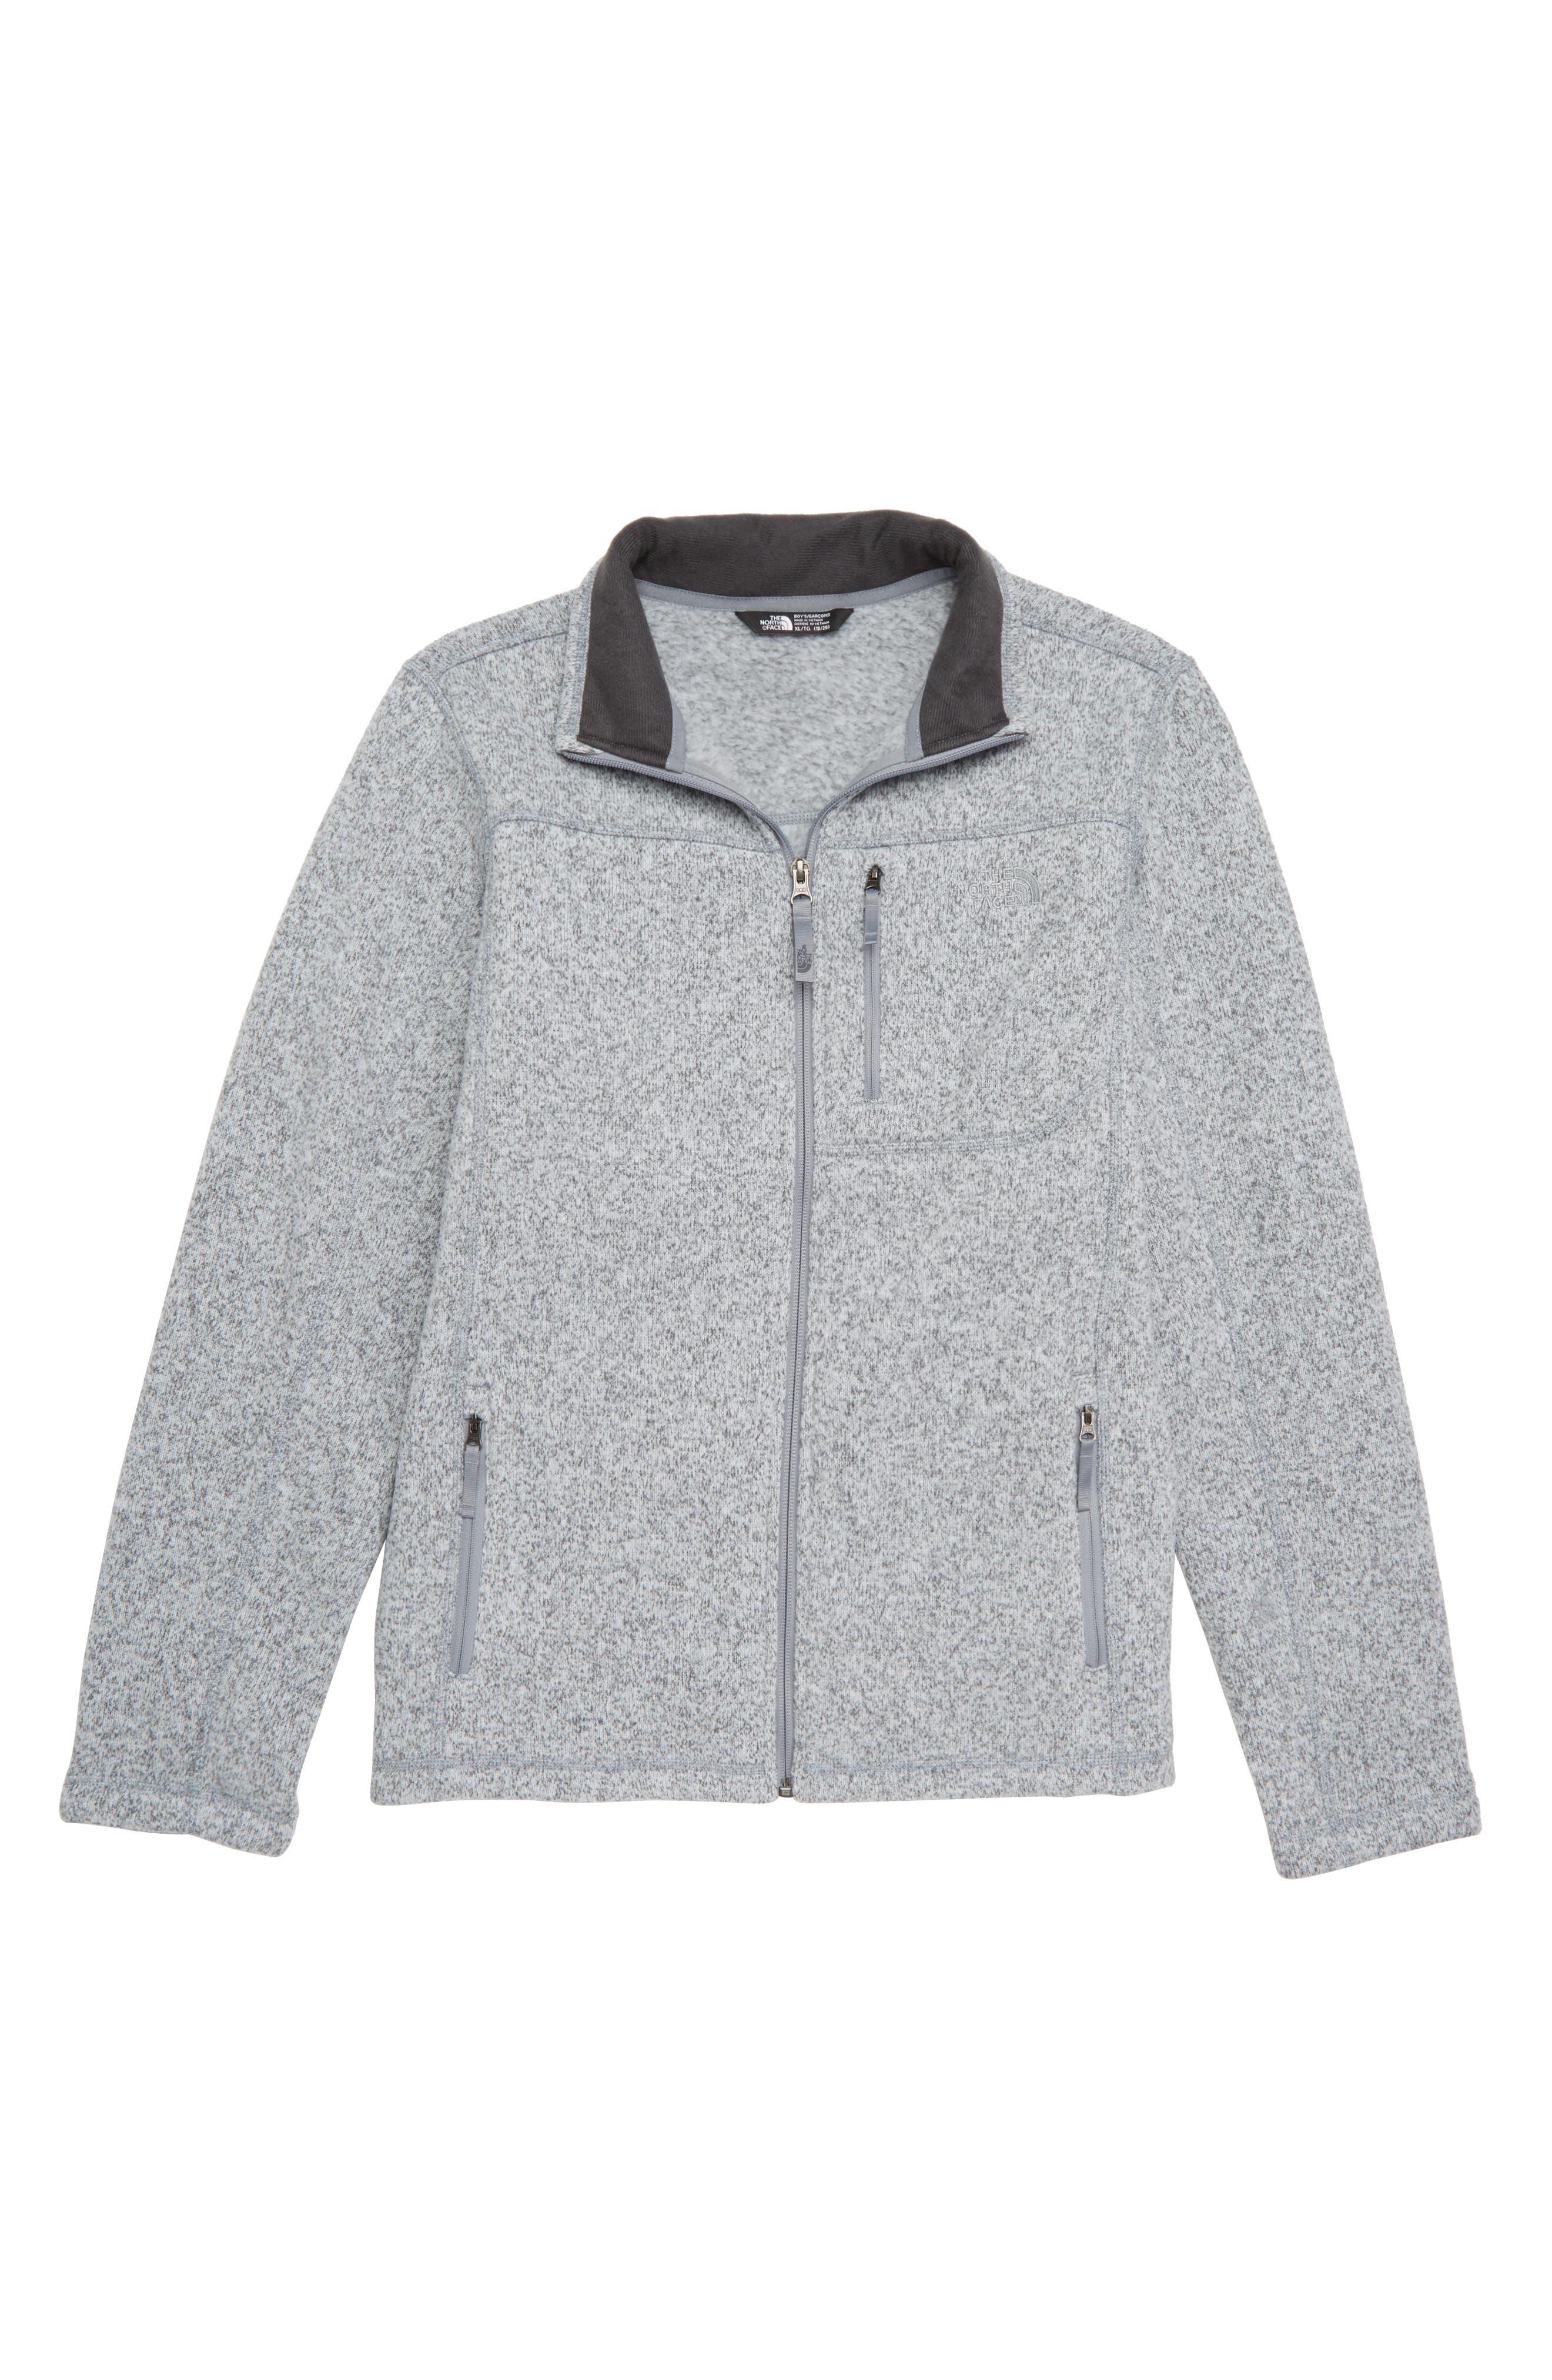 THE NORTH FACE Gordon Lyons Sweater Fleece Zip Jacket, Main, color, MEDIUM HEATHER GREY